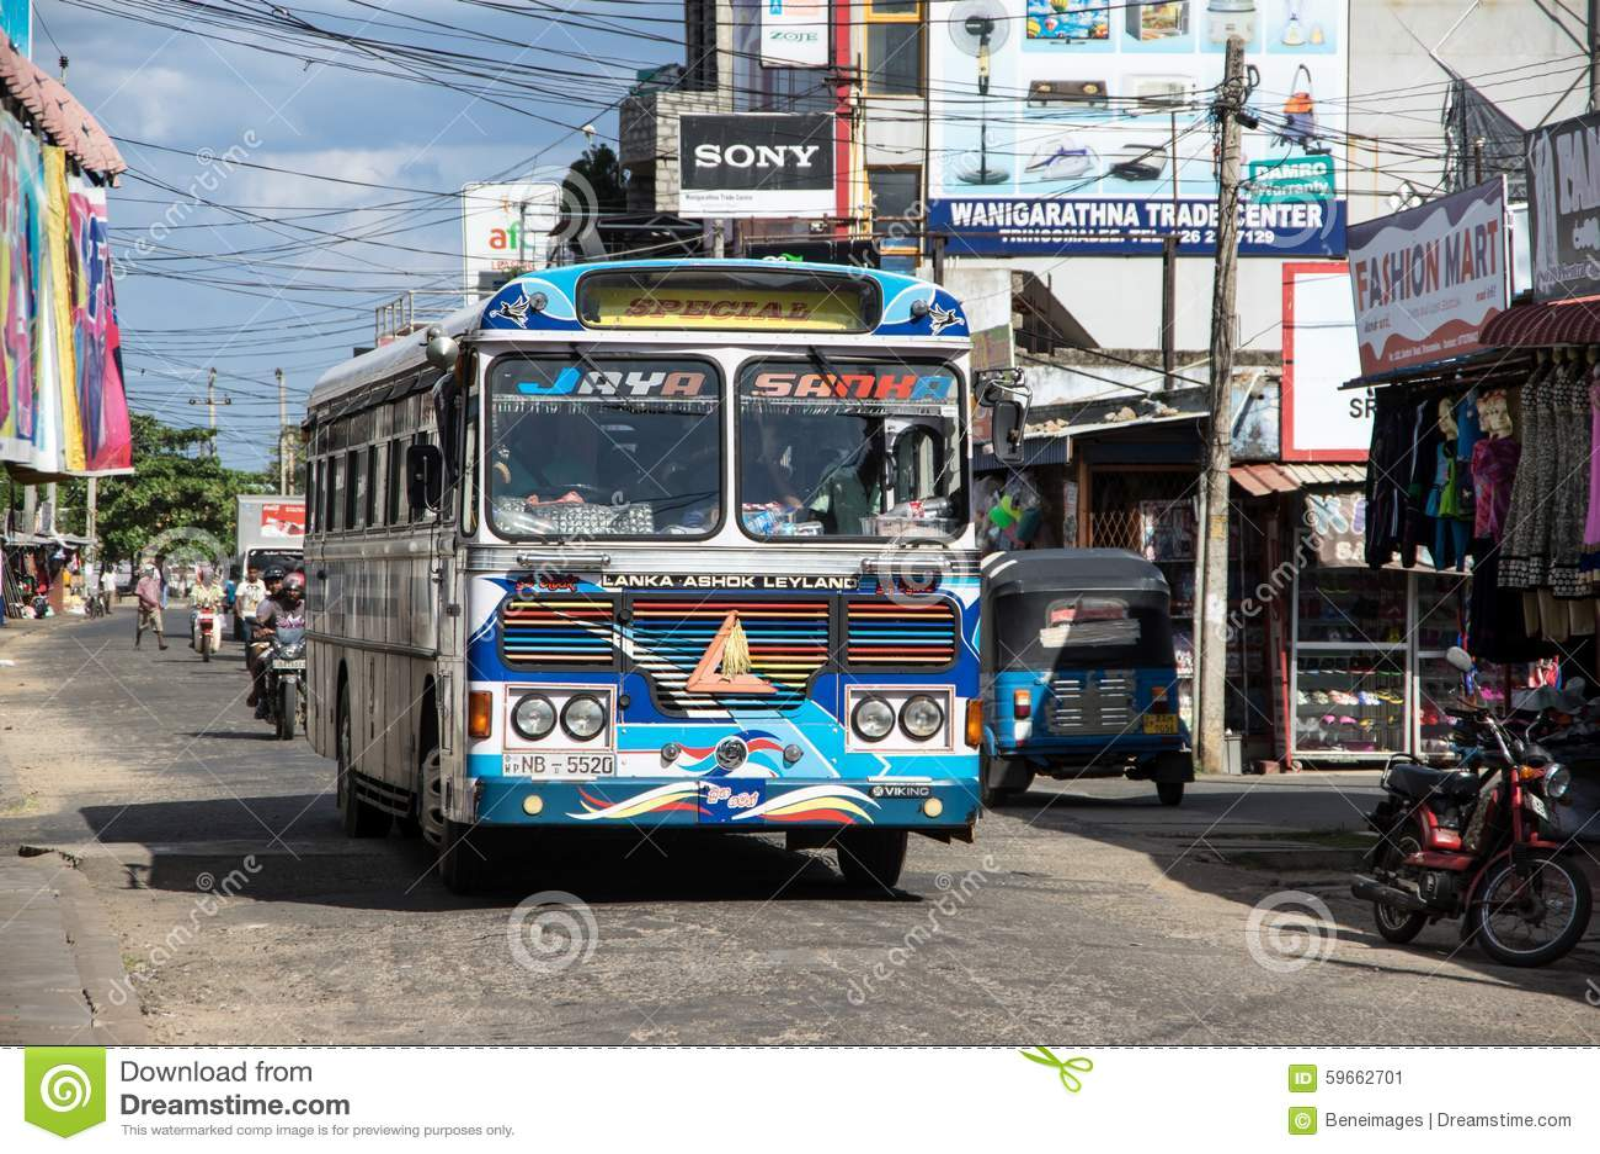 Transport in Sri Lanka. Public transport in Sri Lanka - species development